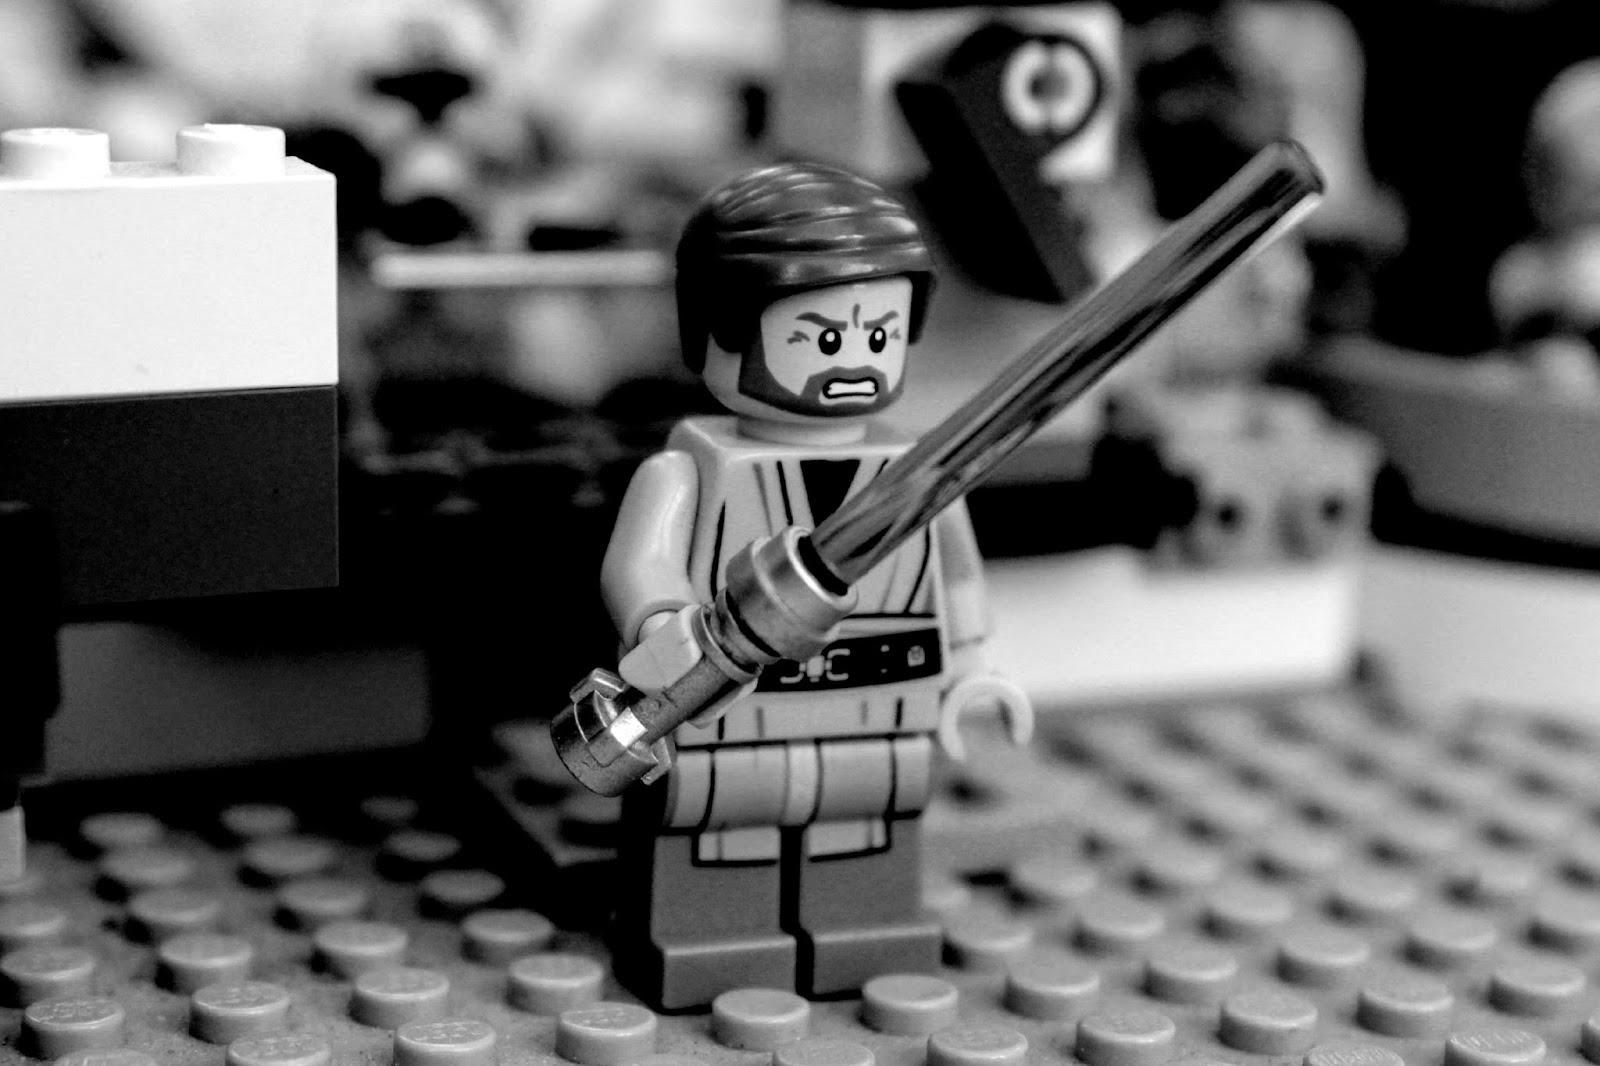 Obi Wan Kenobi Lego // 76sunflowers